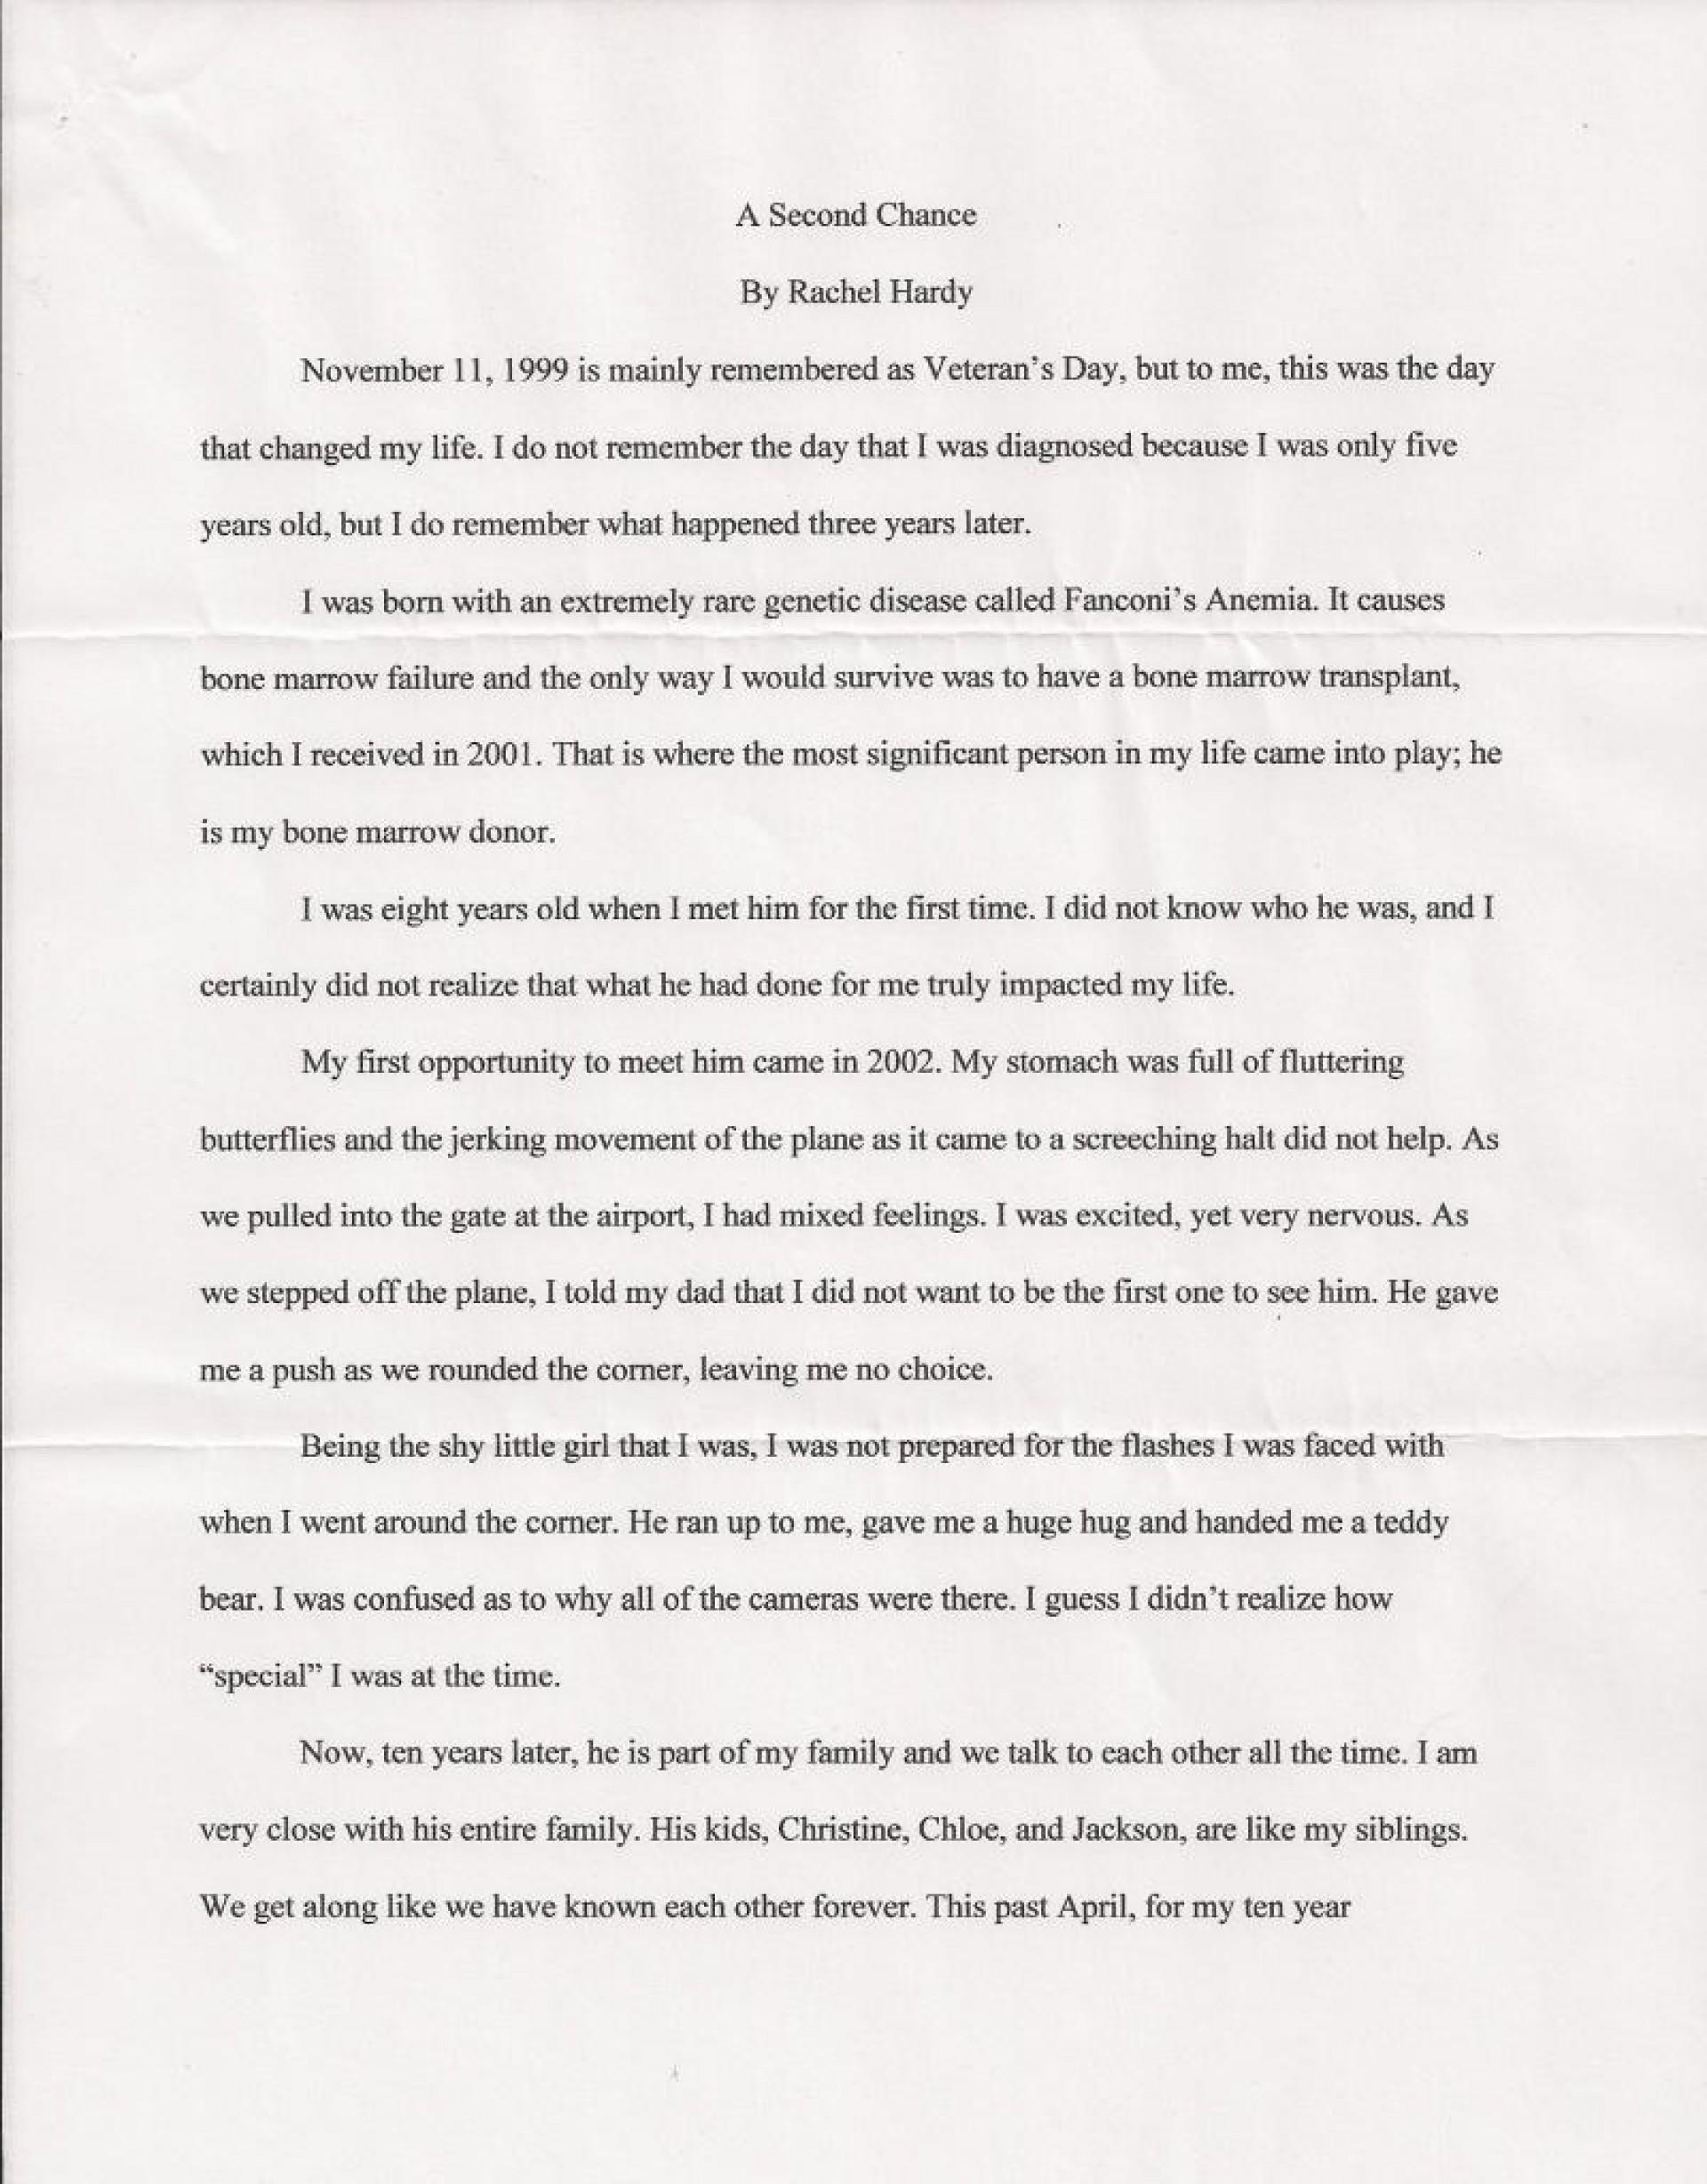 005 Essay Example College Scholarship Rachel Hardy 1 206151151 Std Best Prompts Template Winning Examples 1920